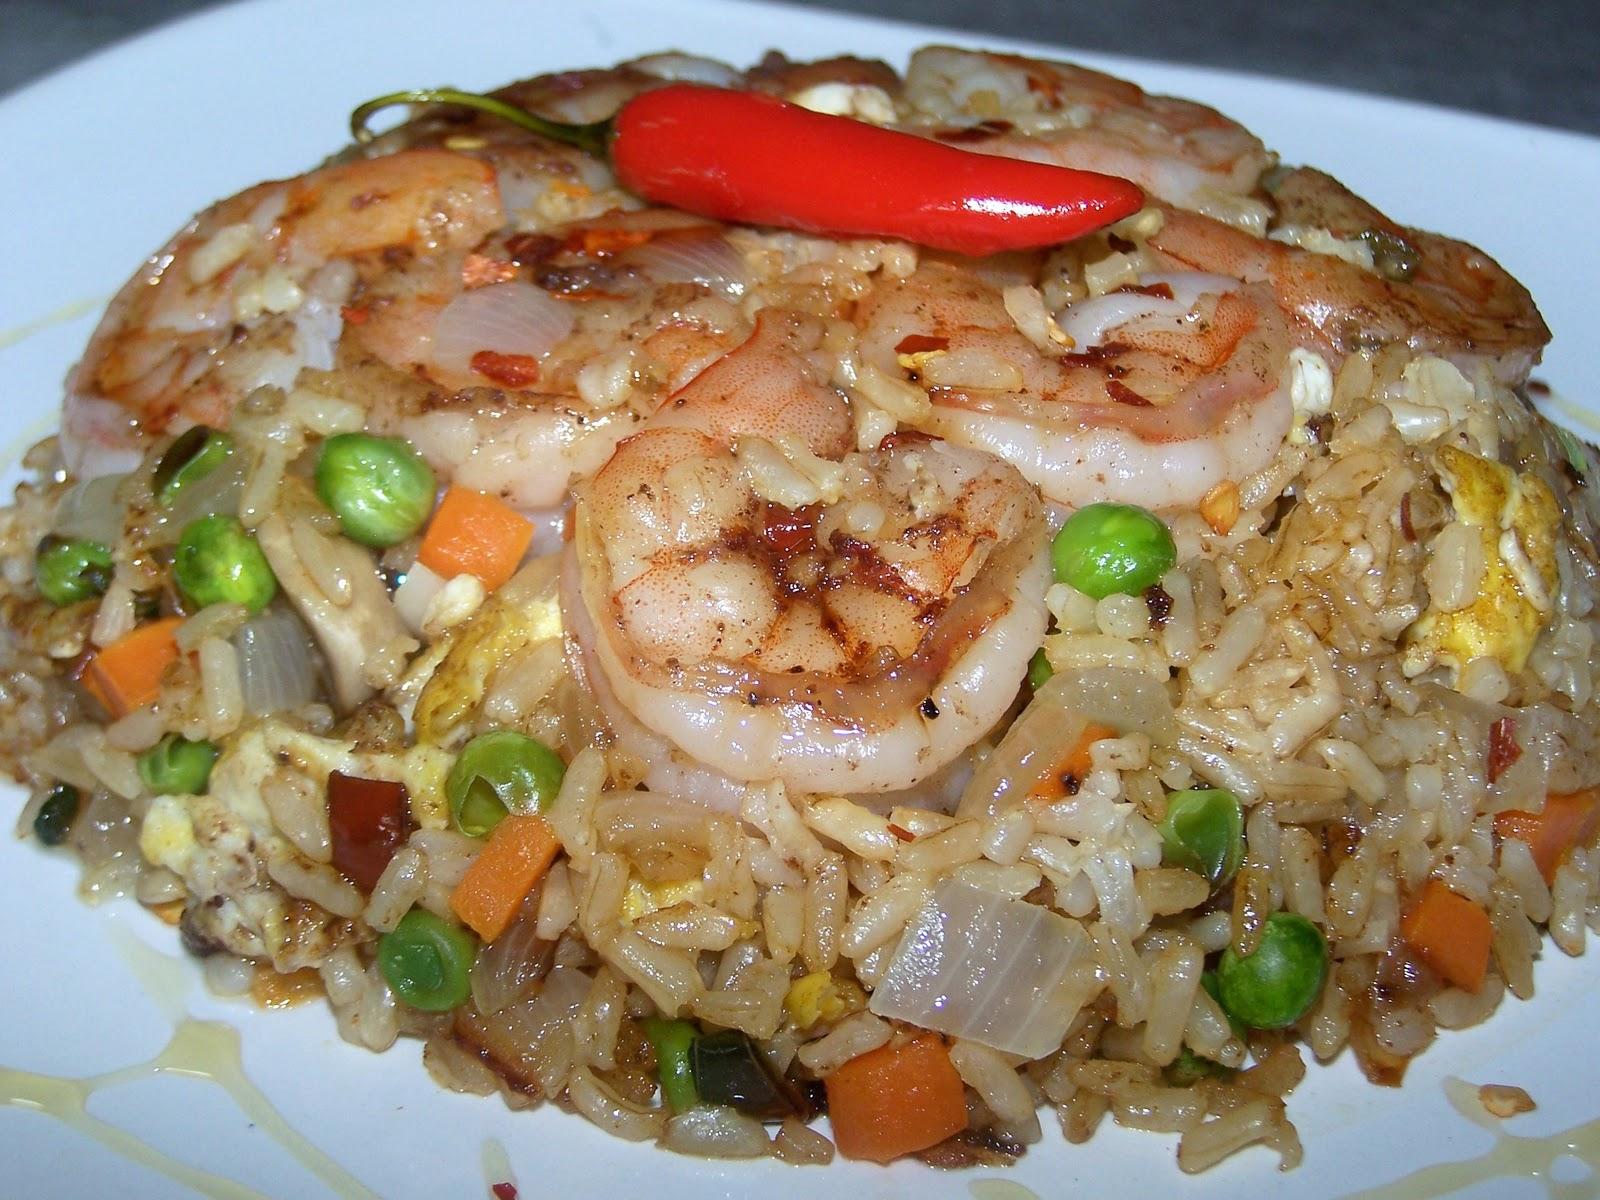 EZ Gluten Free: Five Spice Shrimp Fried Rice